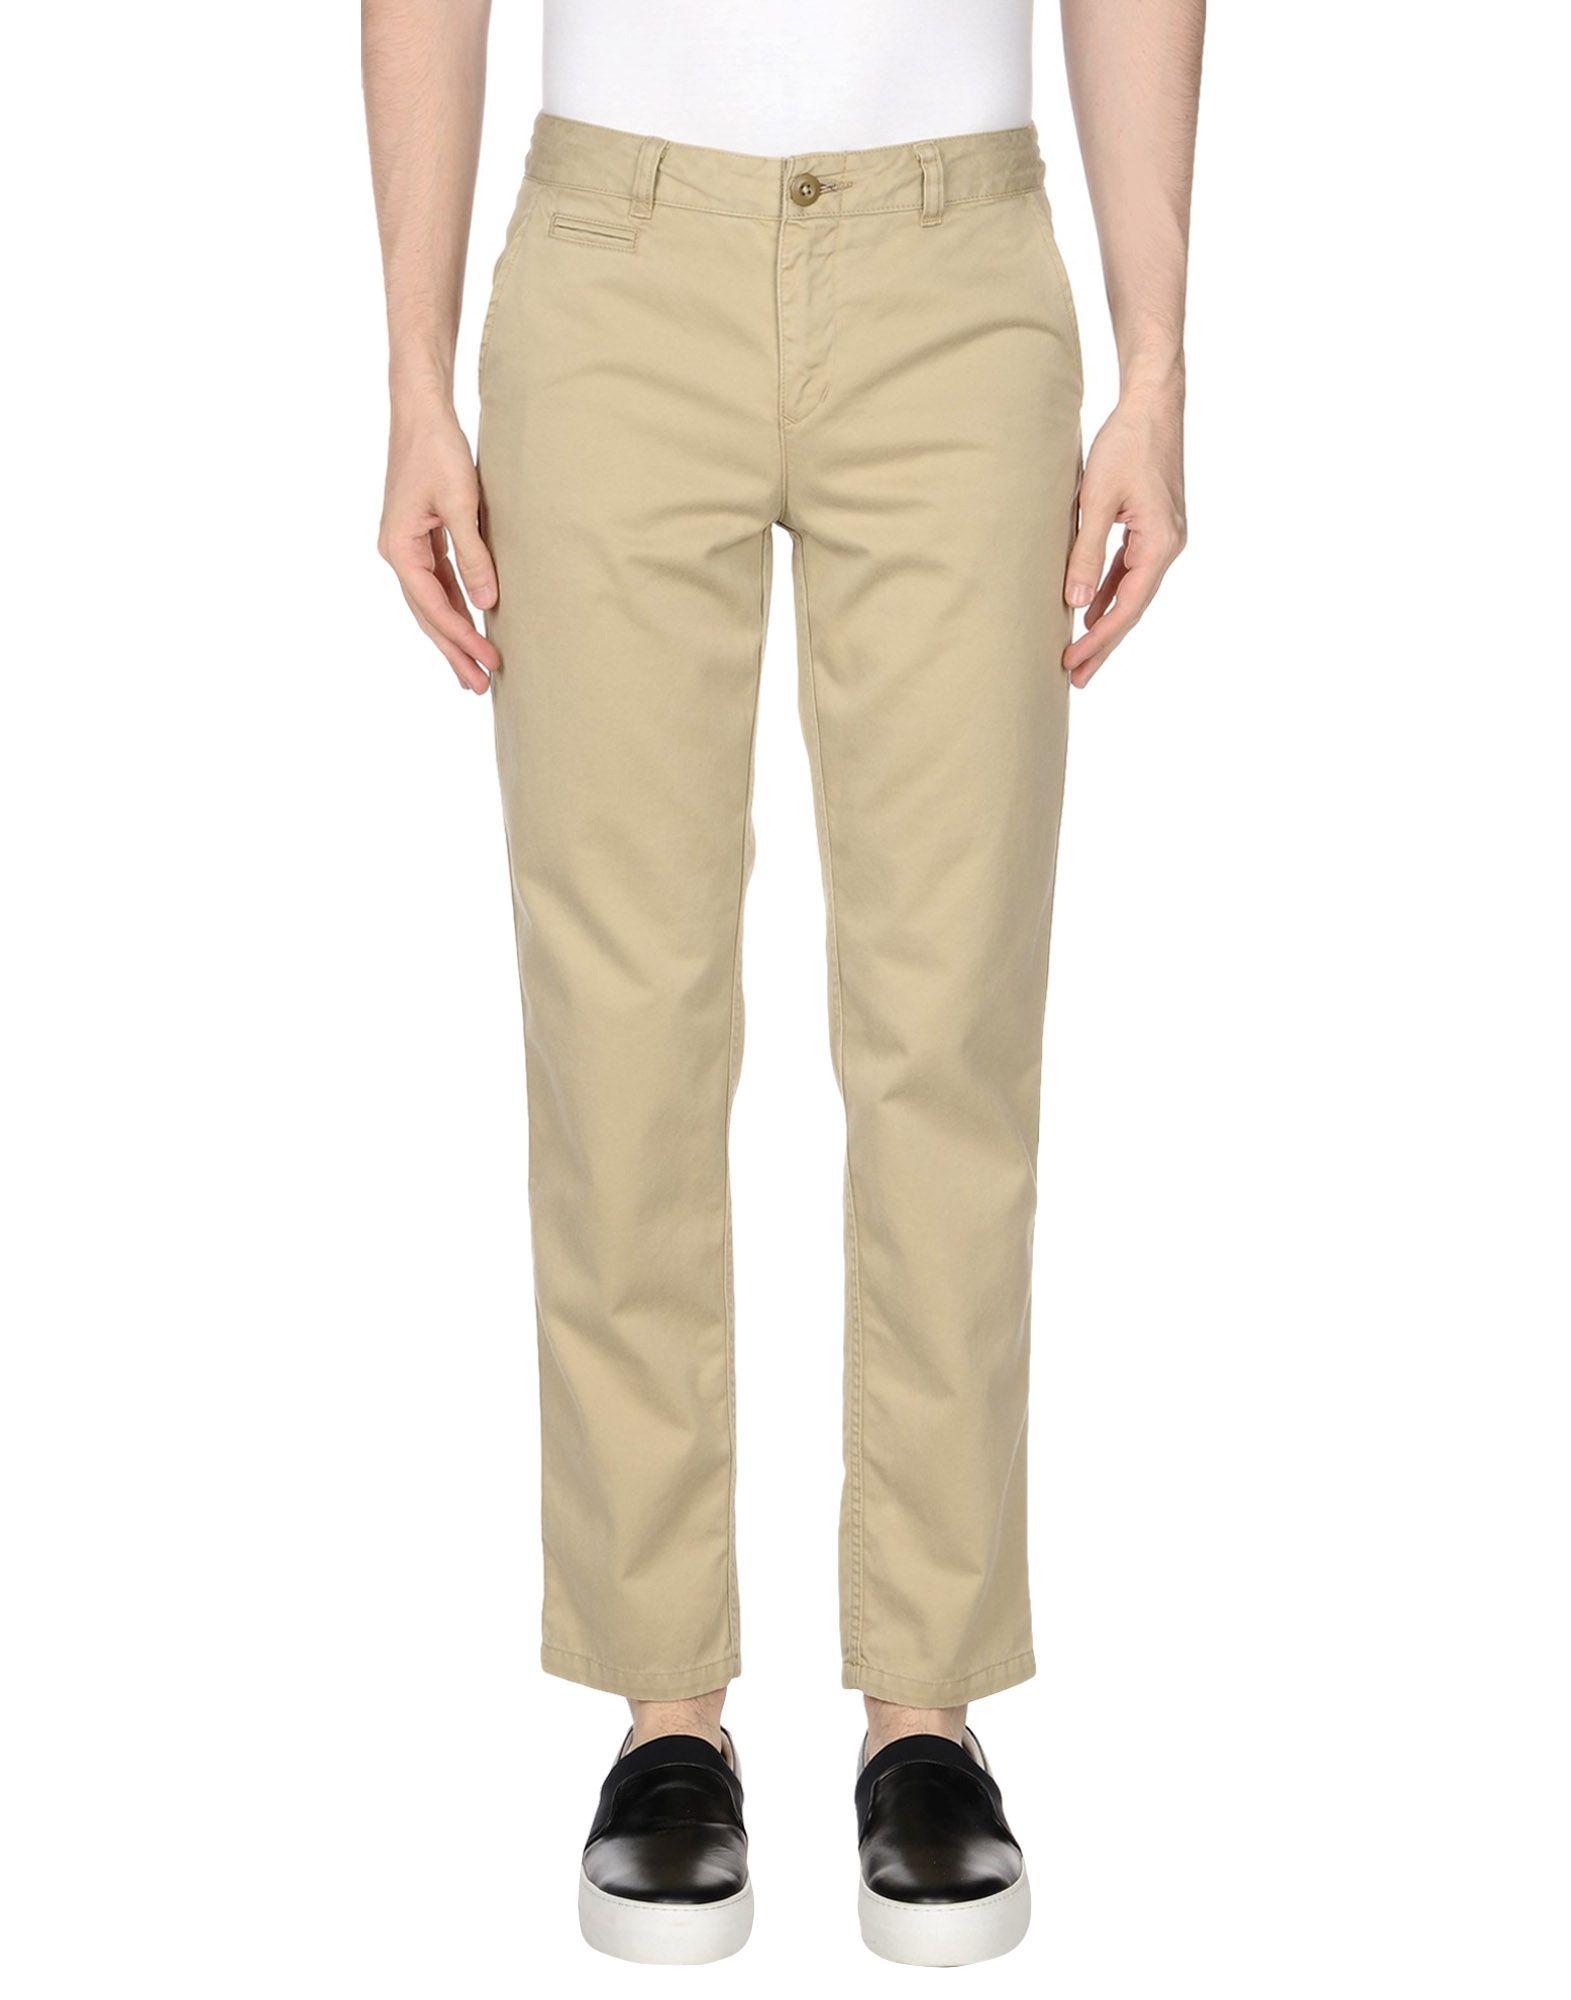 KURO Casual Pants in Beige